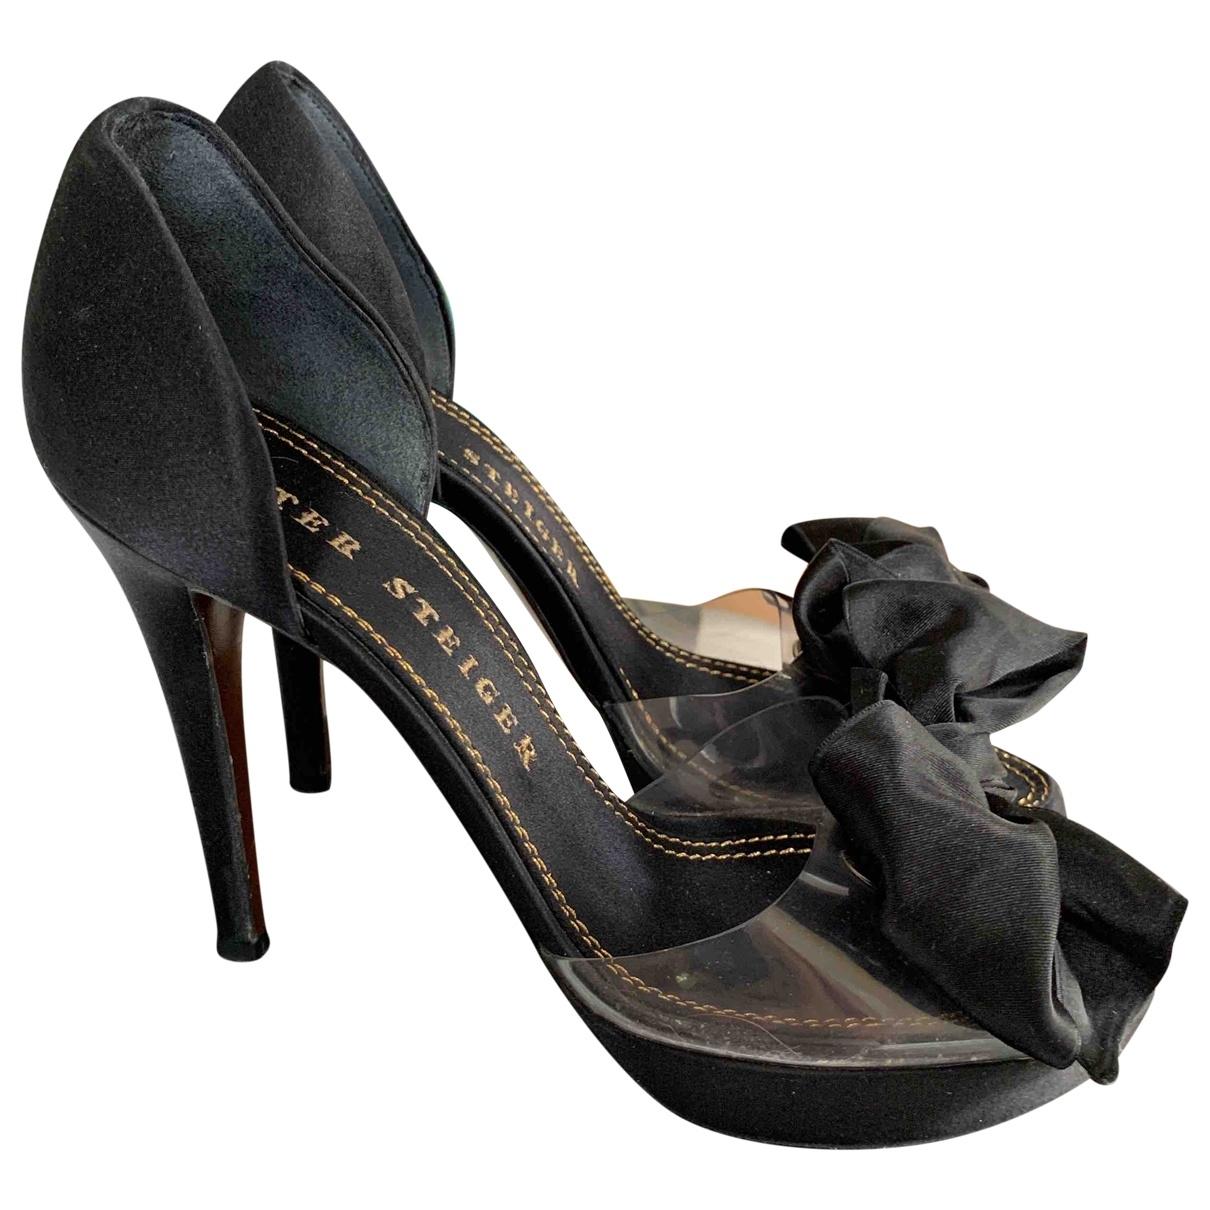 Walter Steiger \N Black Cloth Sandals for Women 39 EU